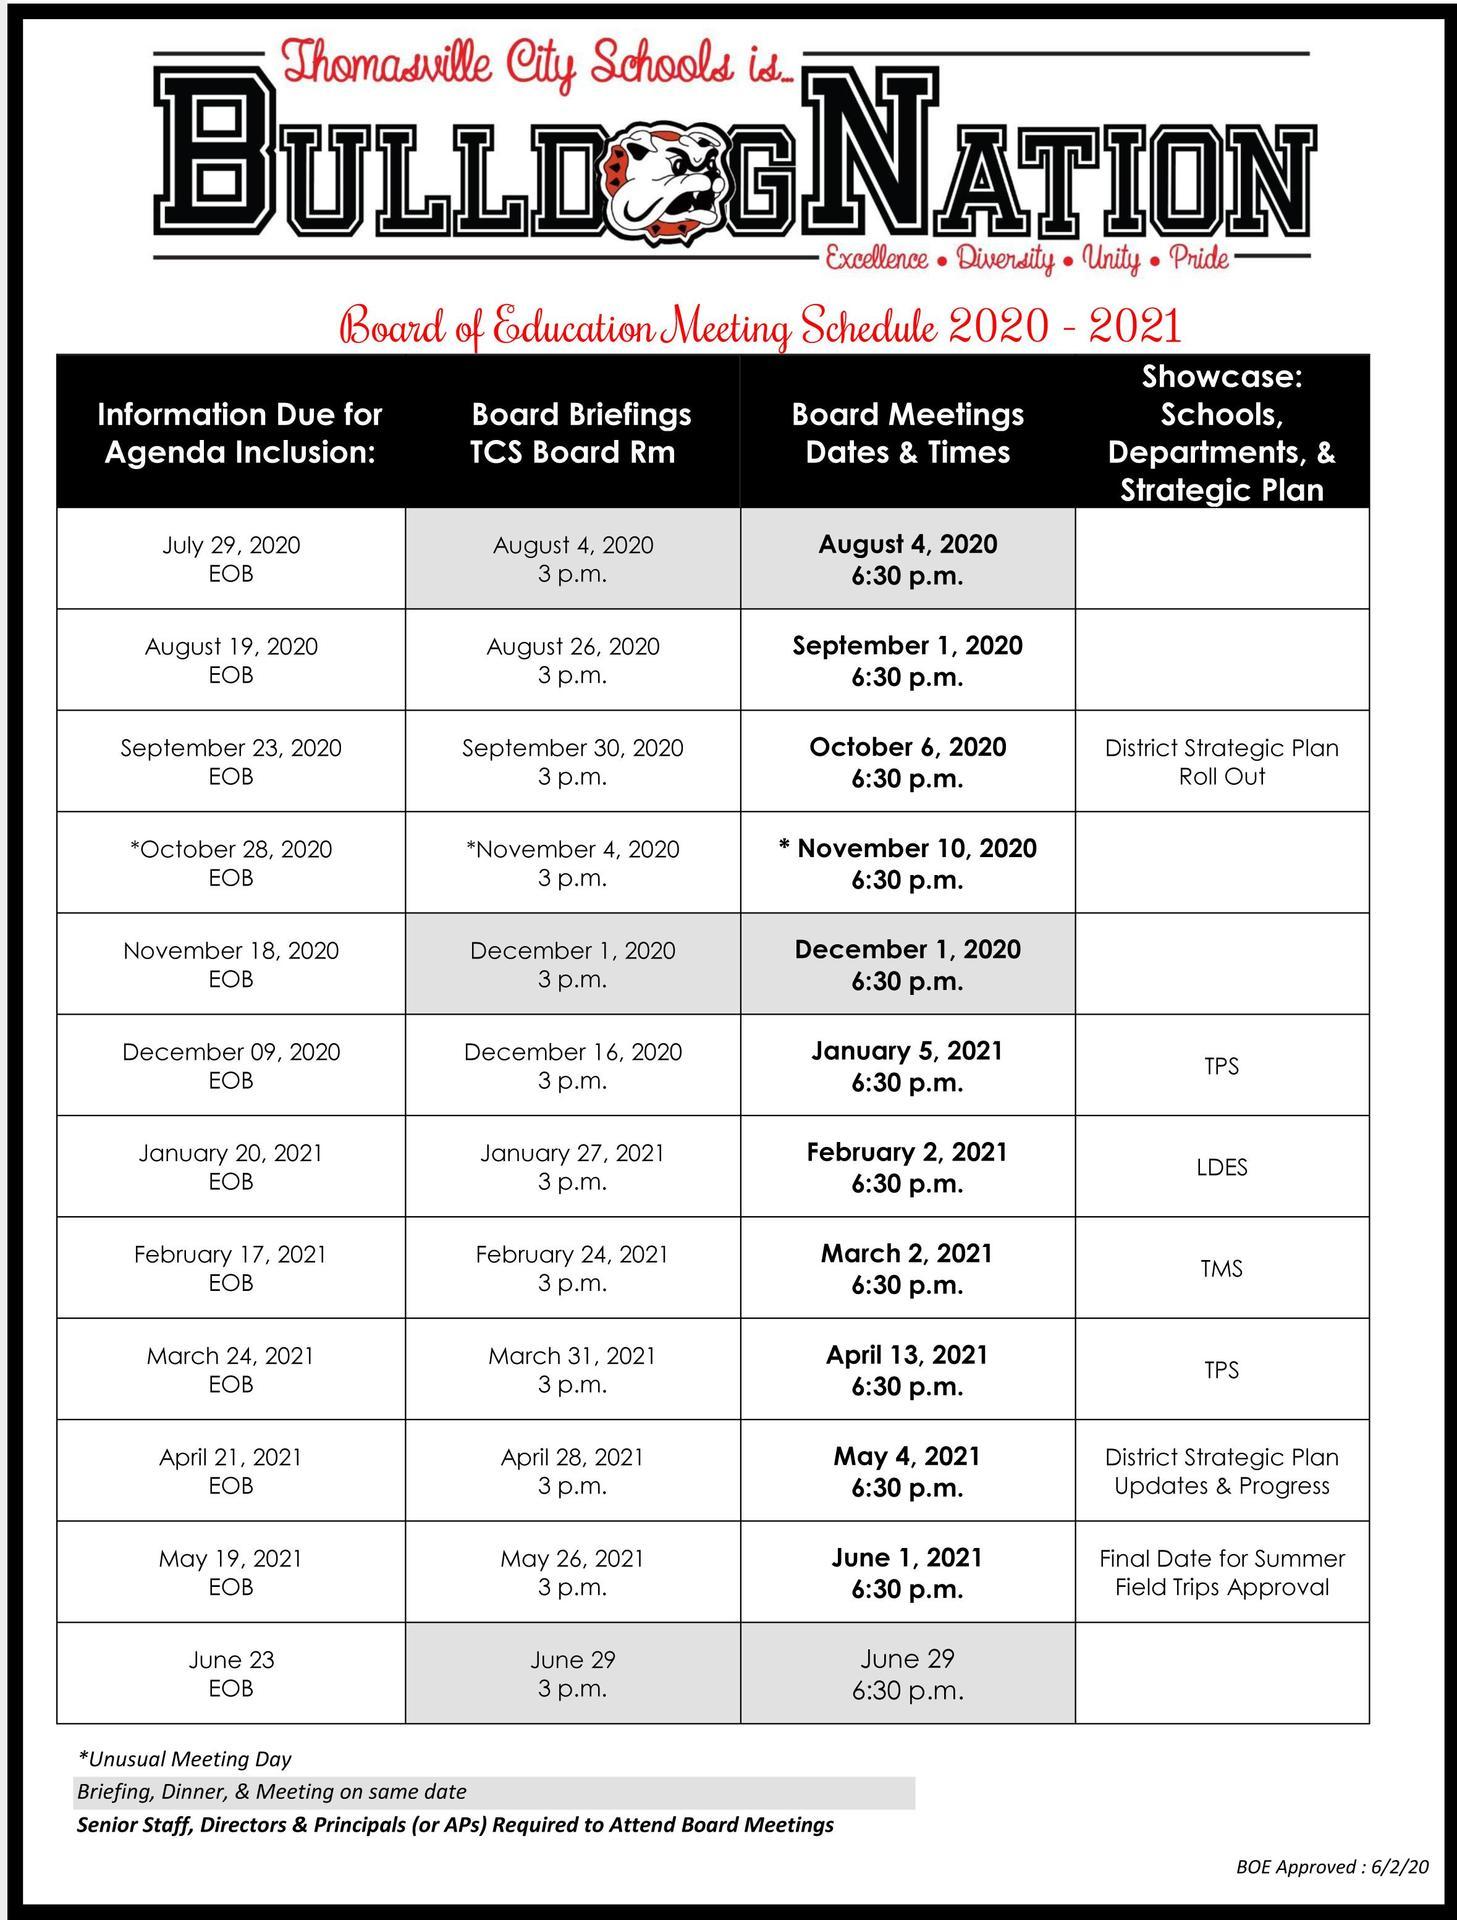 2020-2021 BOE Meeting Schedule